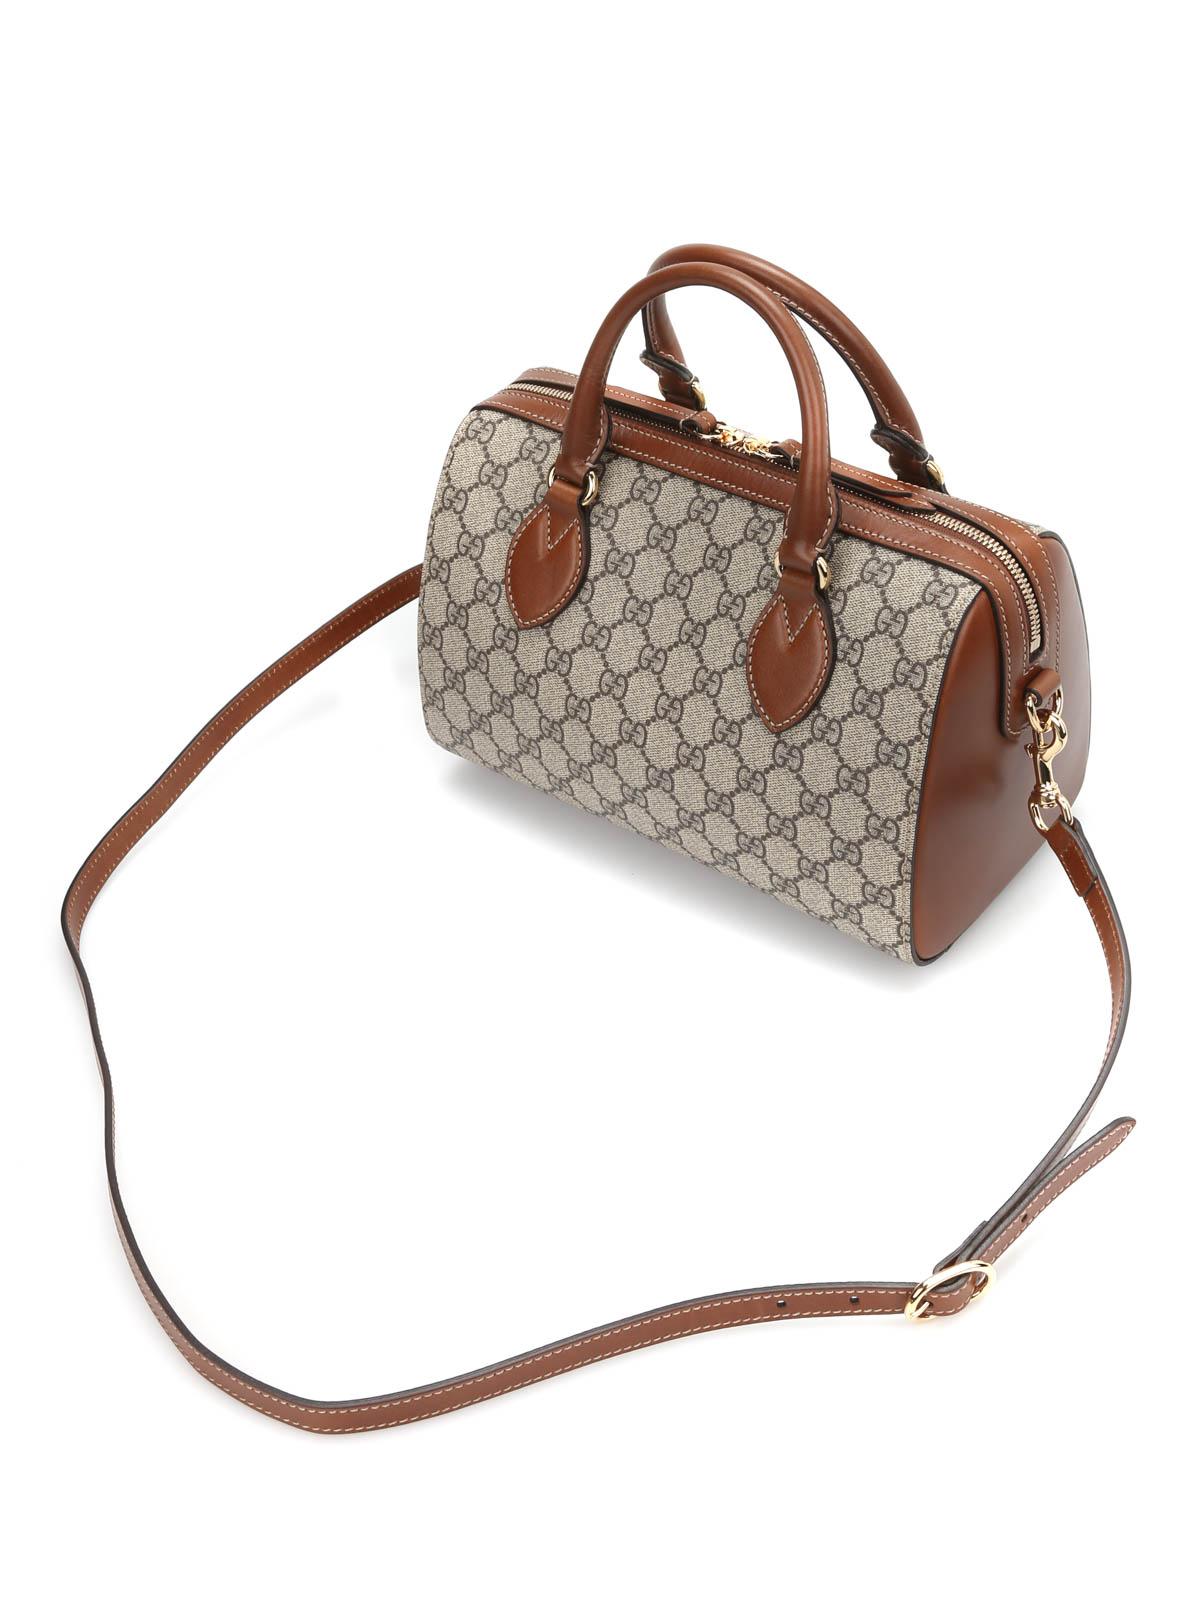 cc97c38d137c Gucci - GG Supreme mini top handle bag - bowling bags - 409529 KLQHG ...